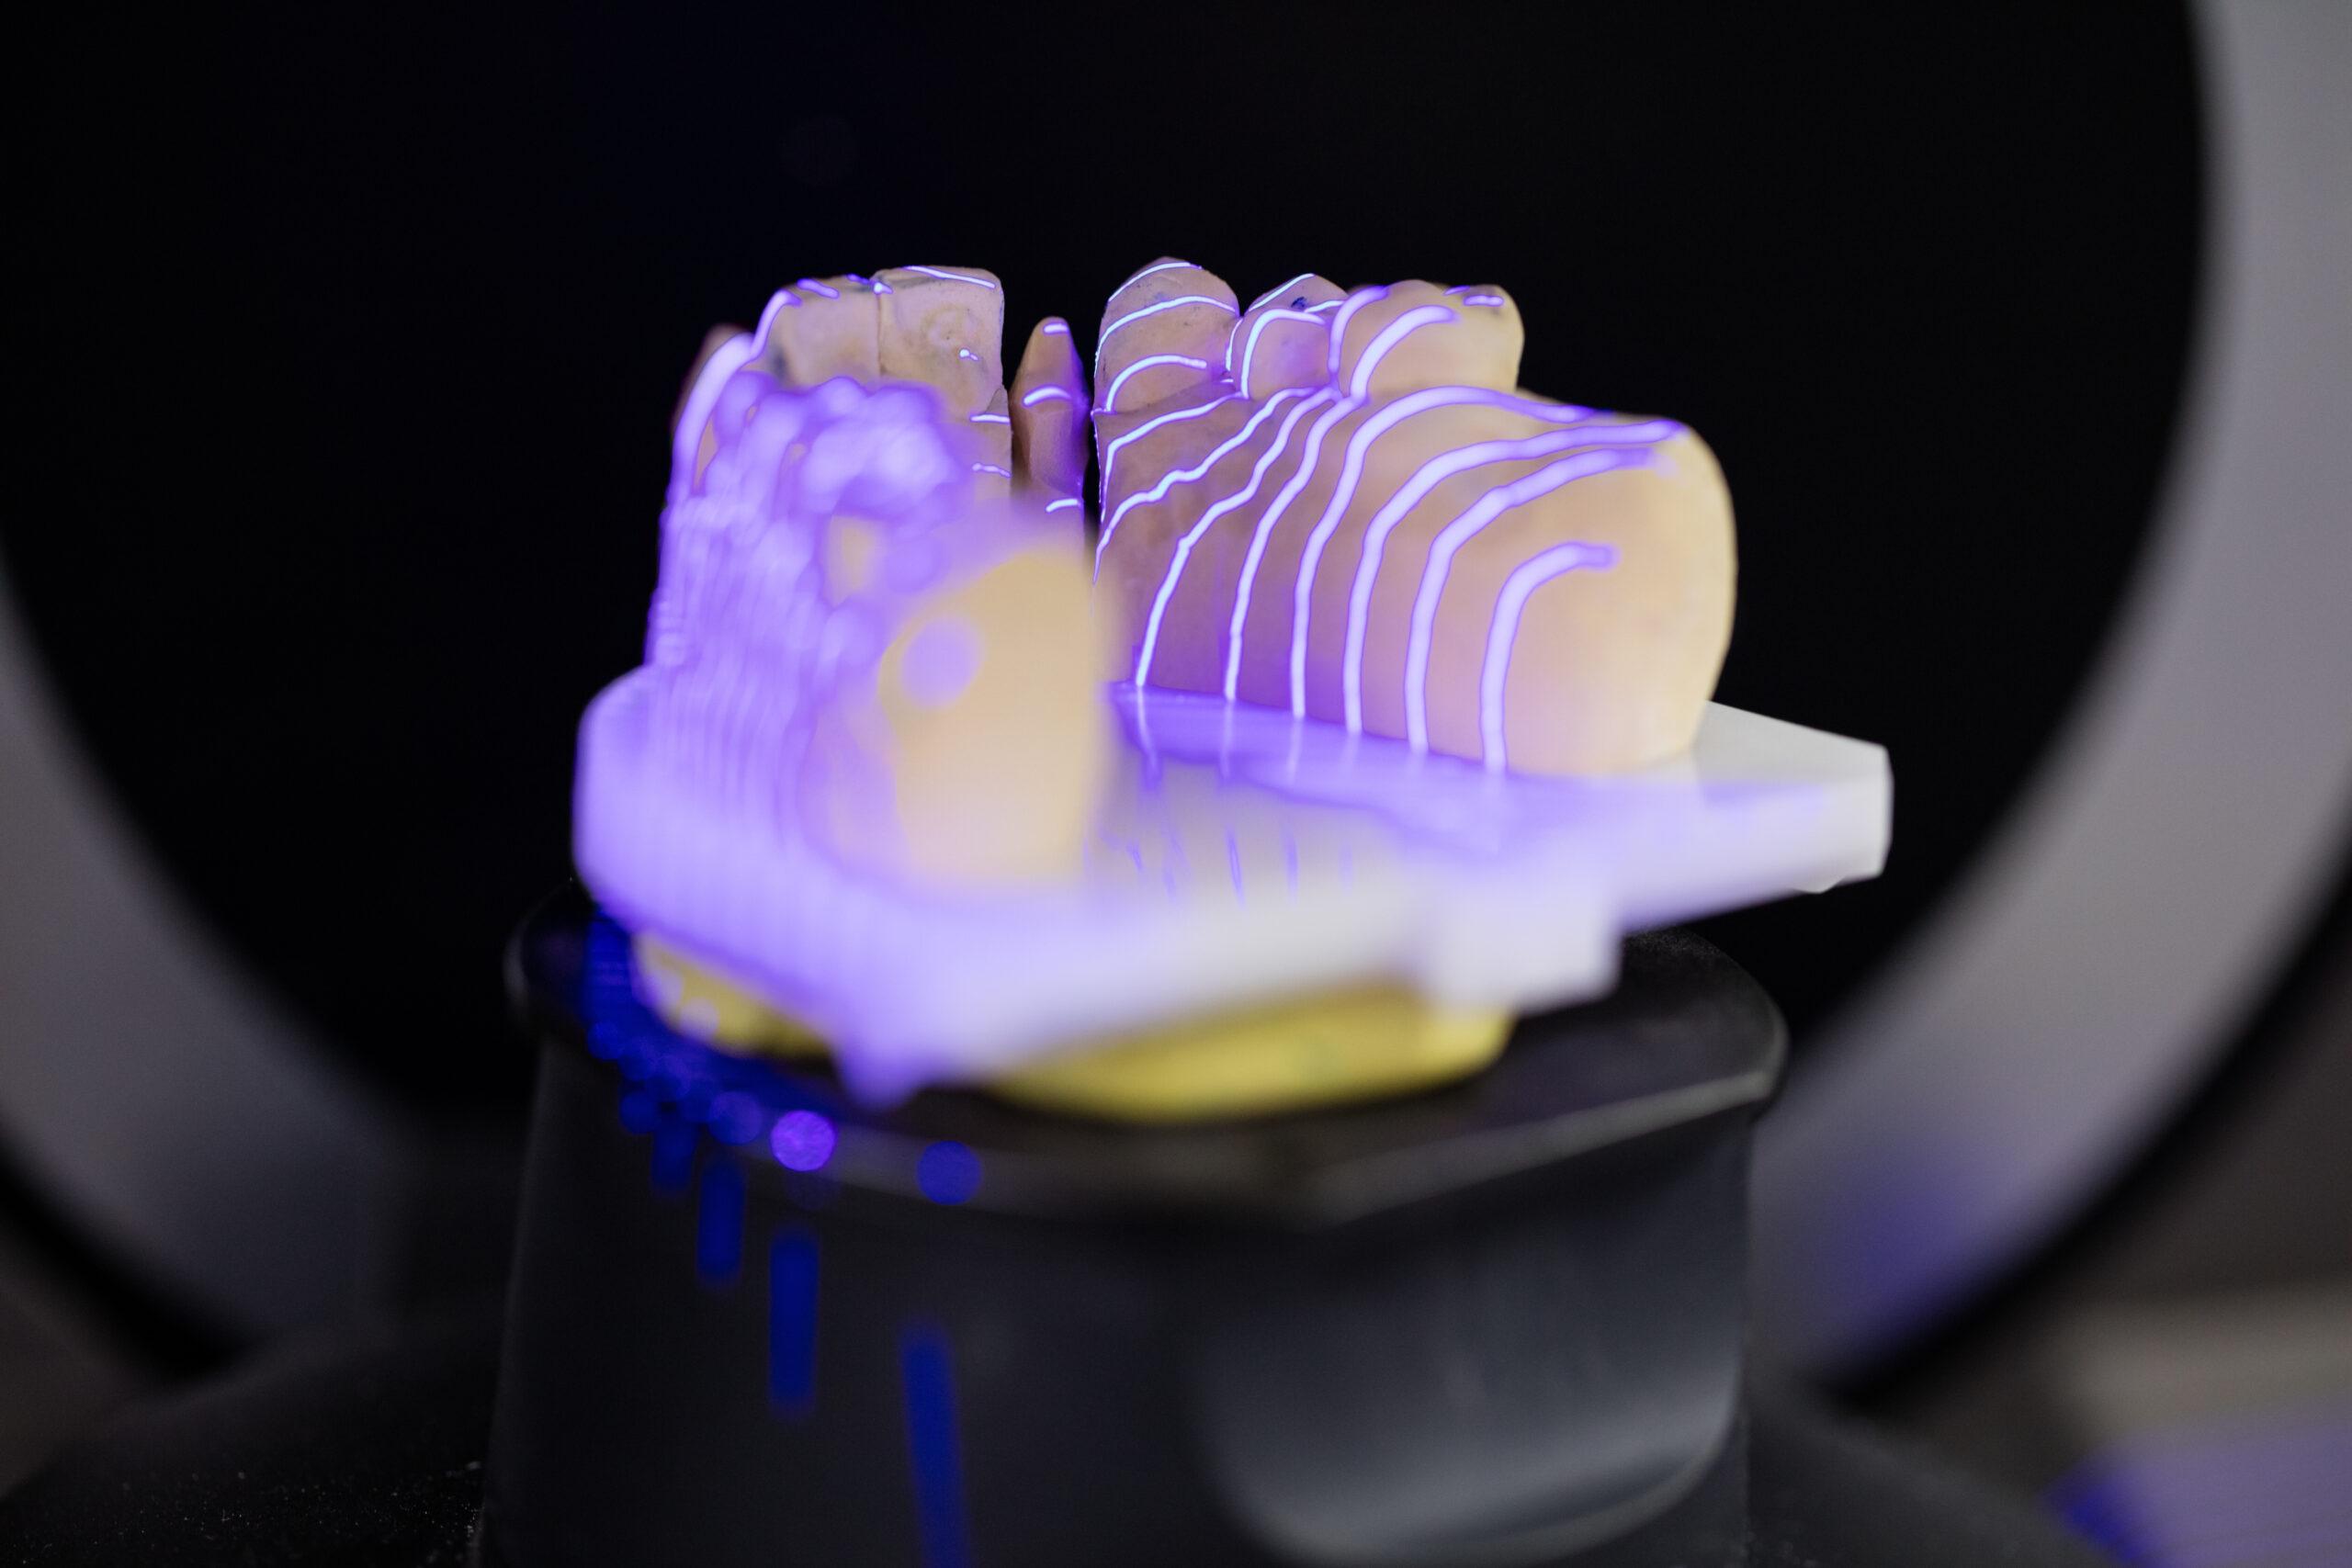 Dental crown mold inspection using structured light laser illumination